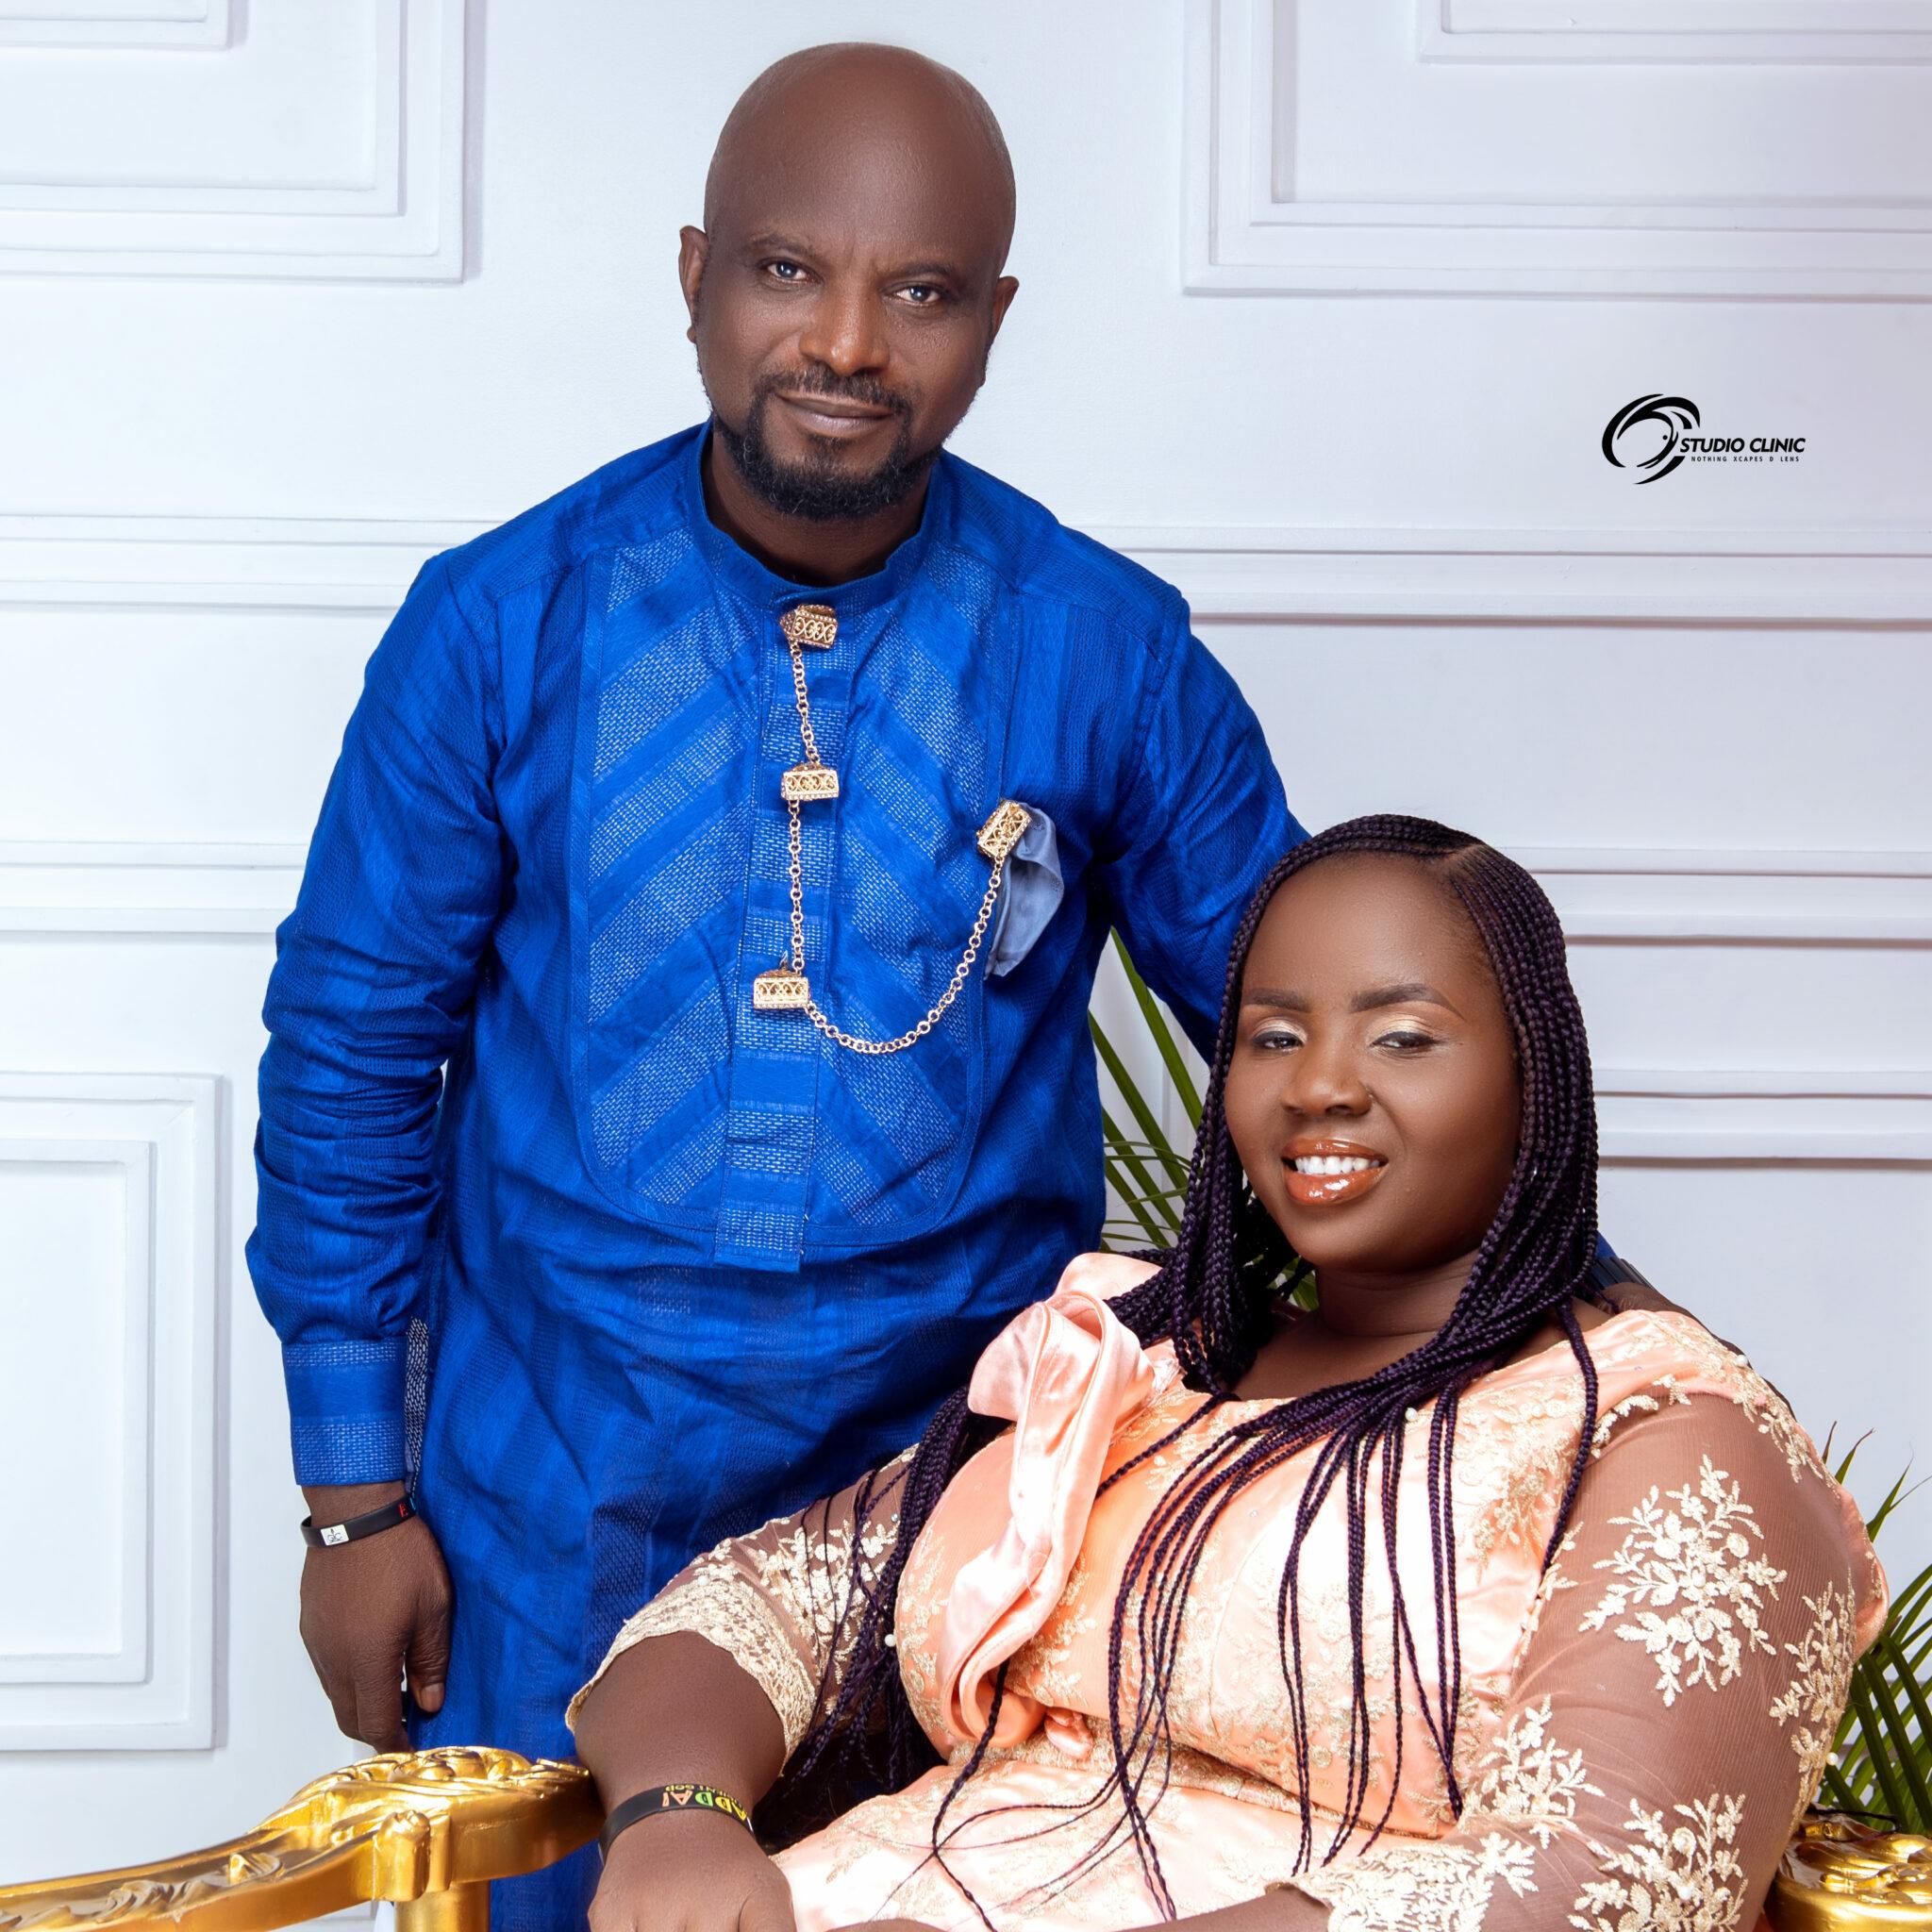 Pastor & Mrs. Joshua Chukwuemeka